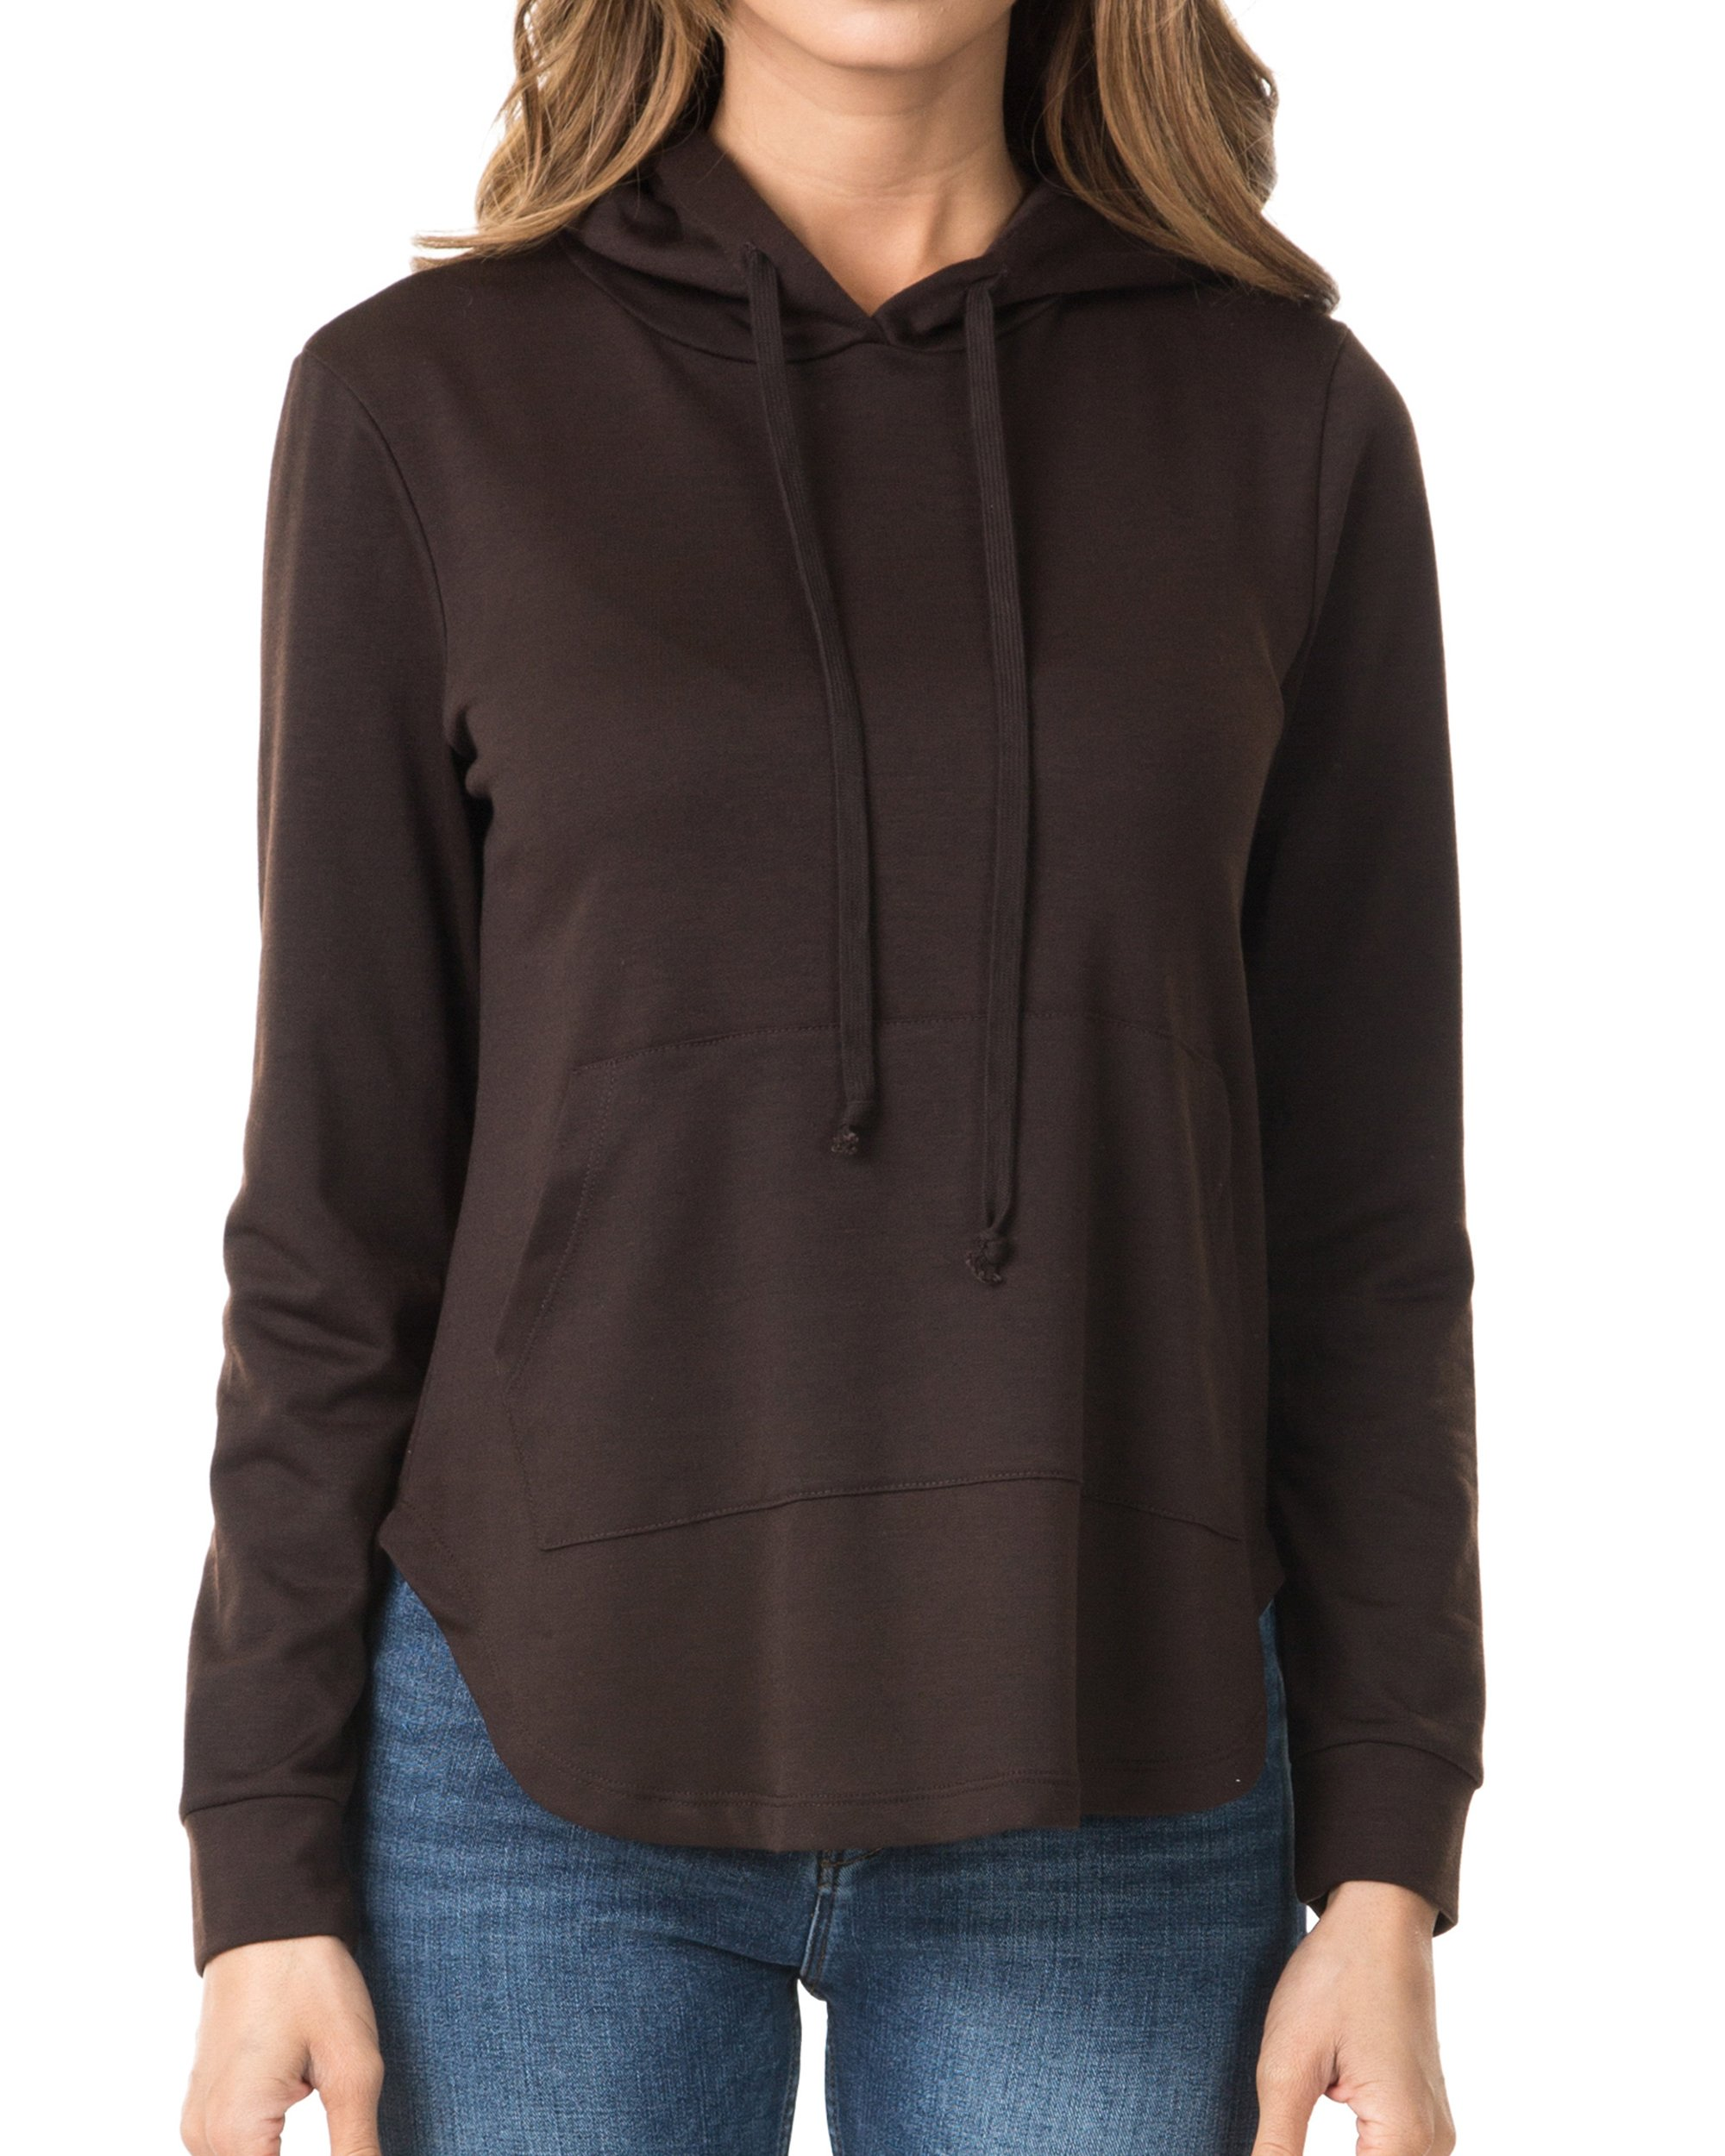 Nolabel [B7_023 Women's Long Sleeve Pullover French Terry Drawstring Hoodie Sweatshirt (Brown/XL)